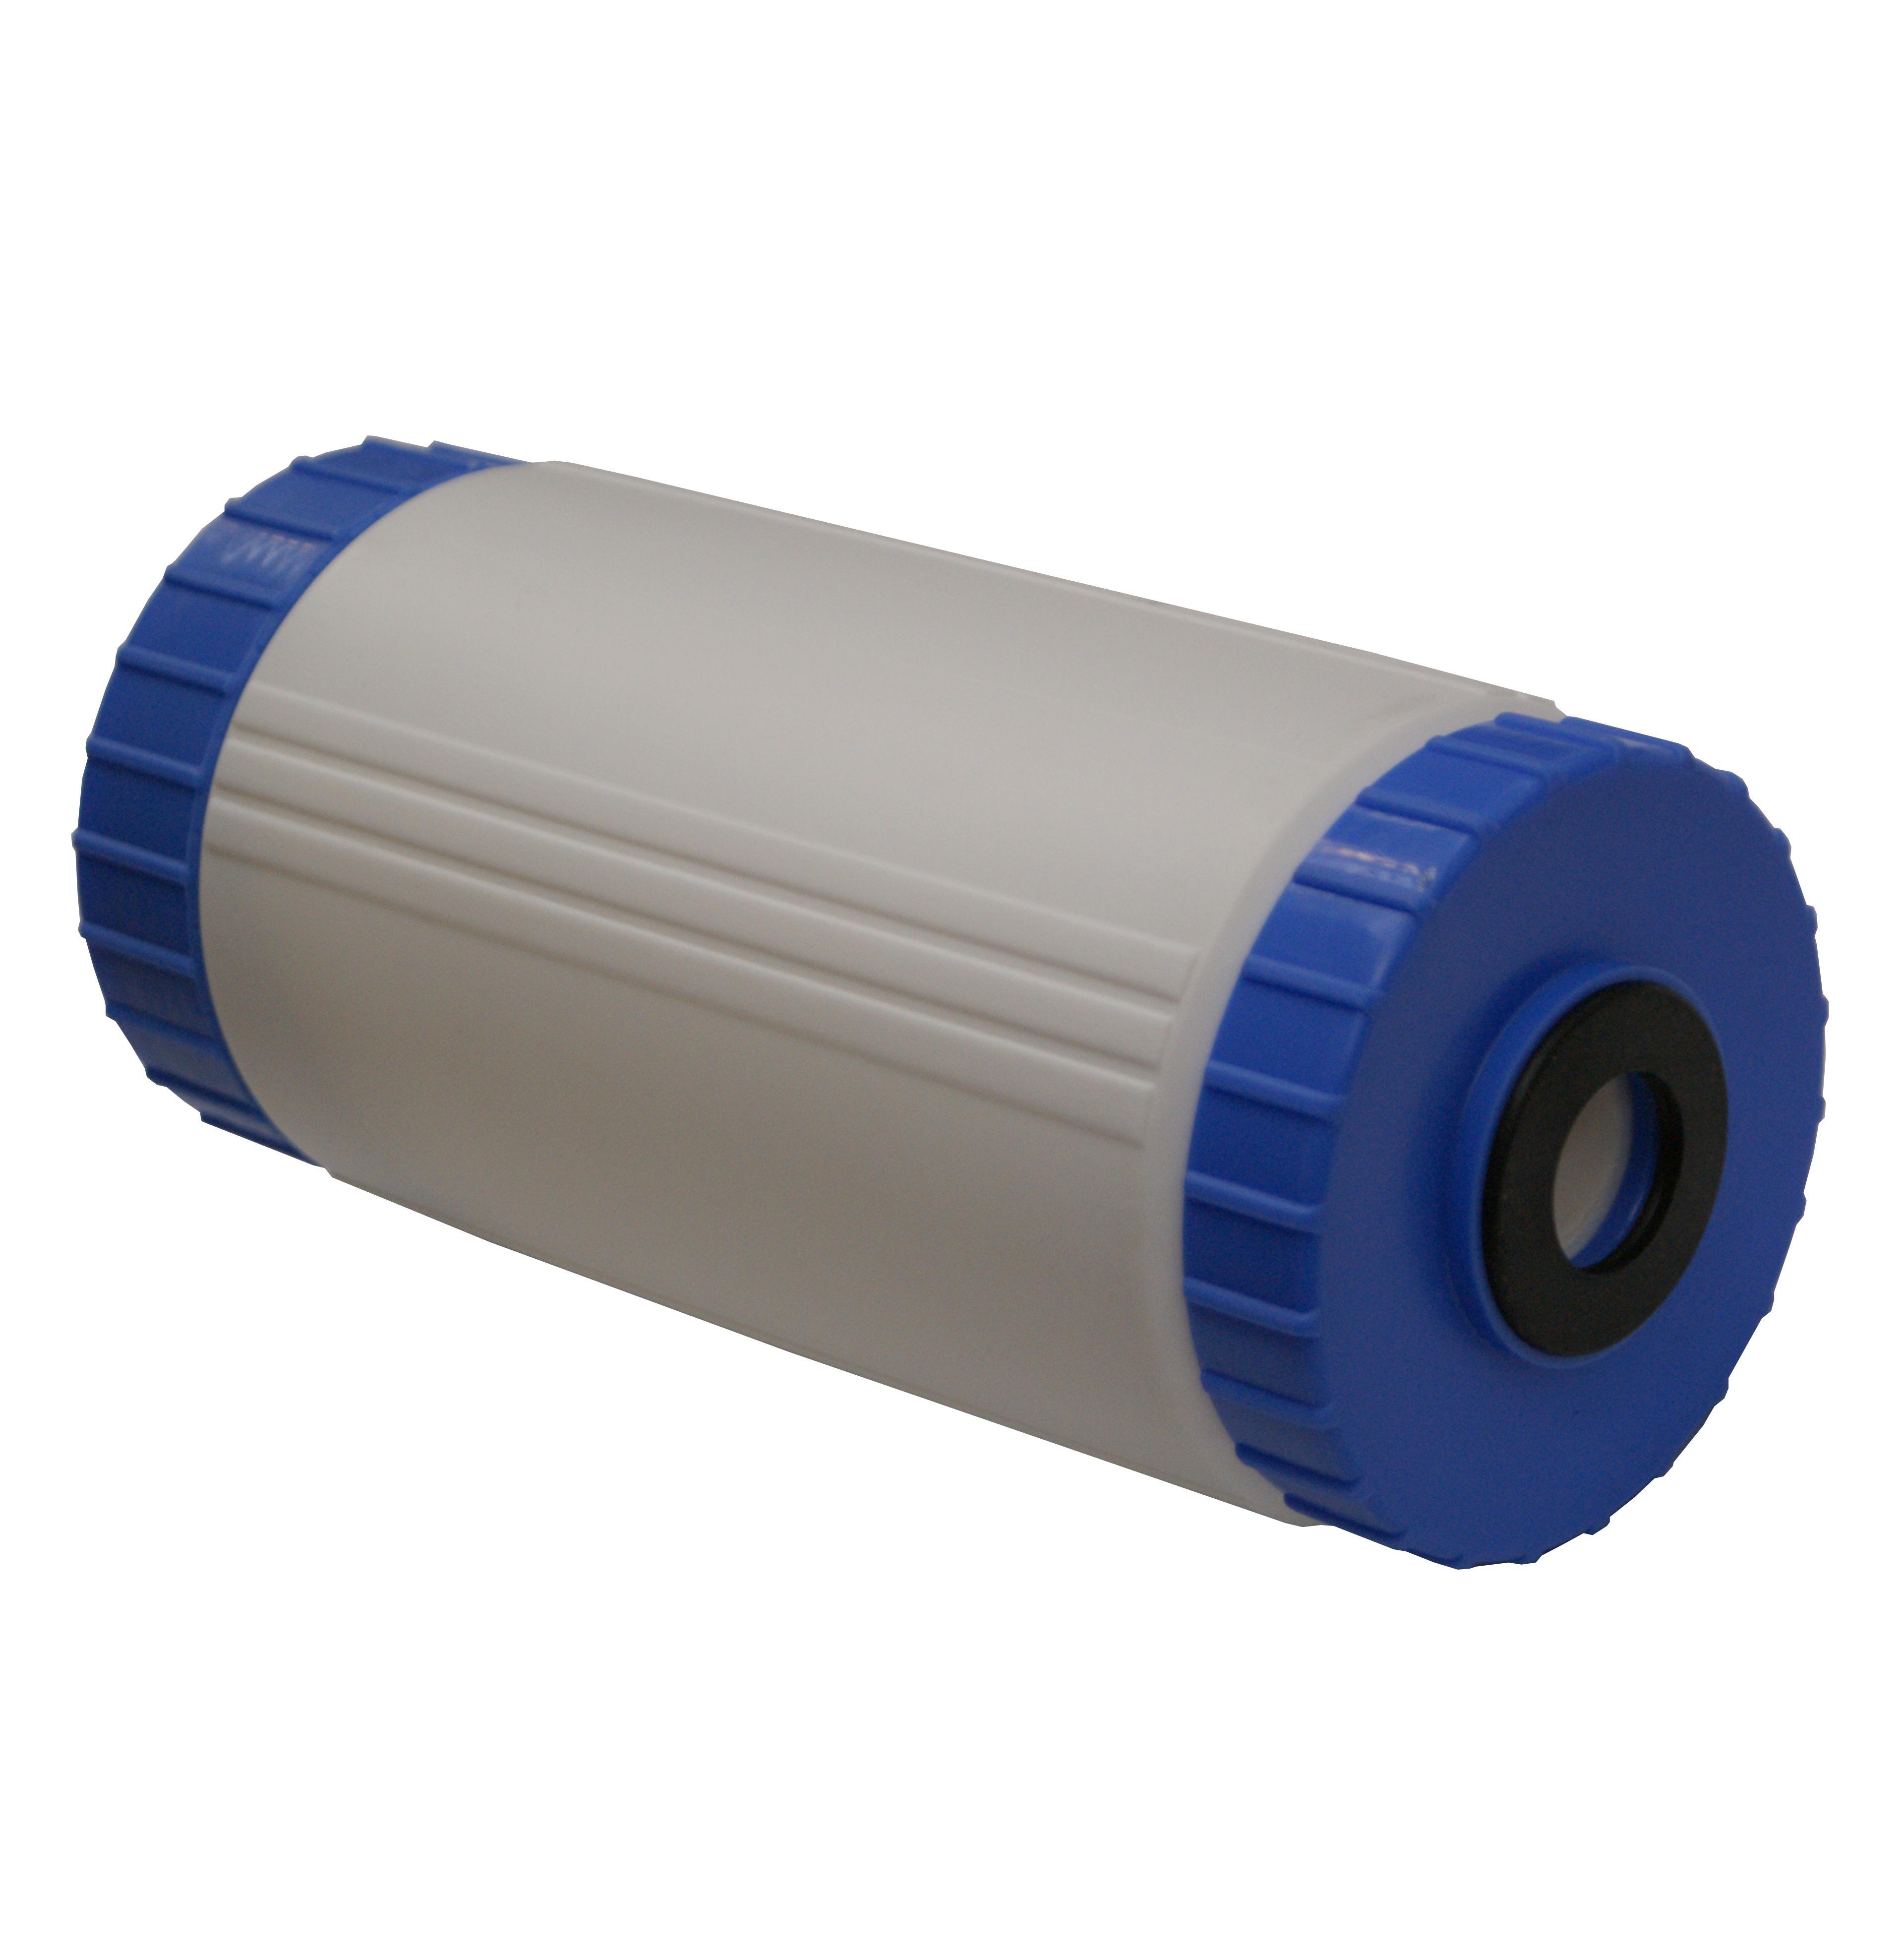 10 Refillable Cartridge